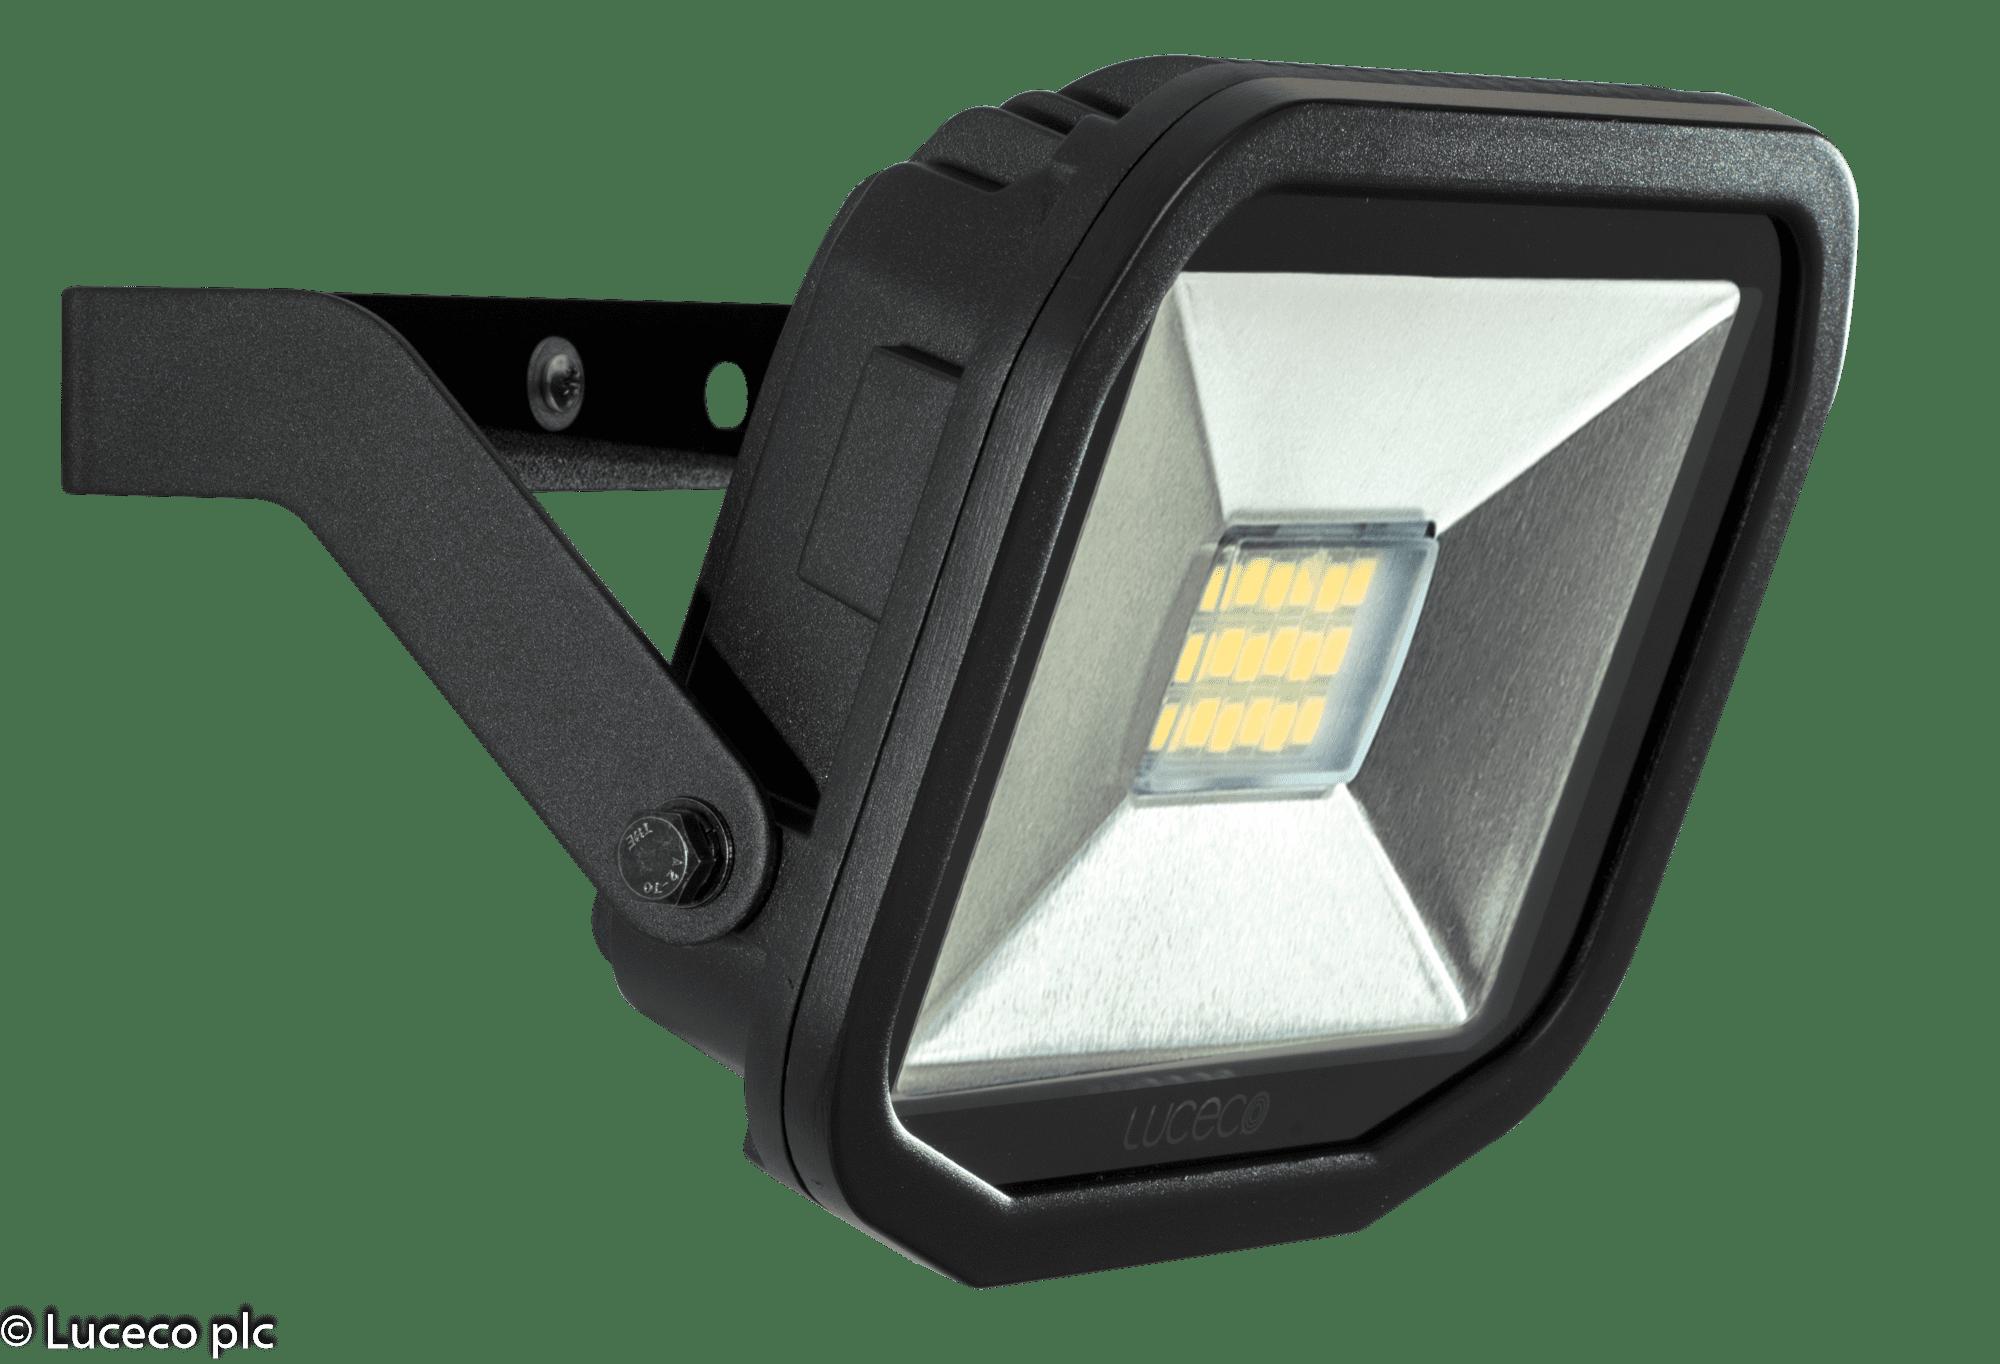 Luceco LED FLuter 38W 5000K 3000lm (500W) #LFS30B150